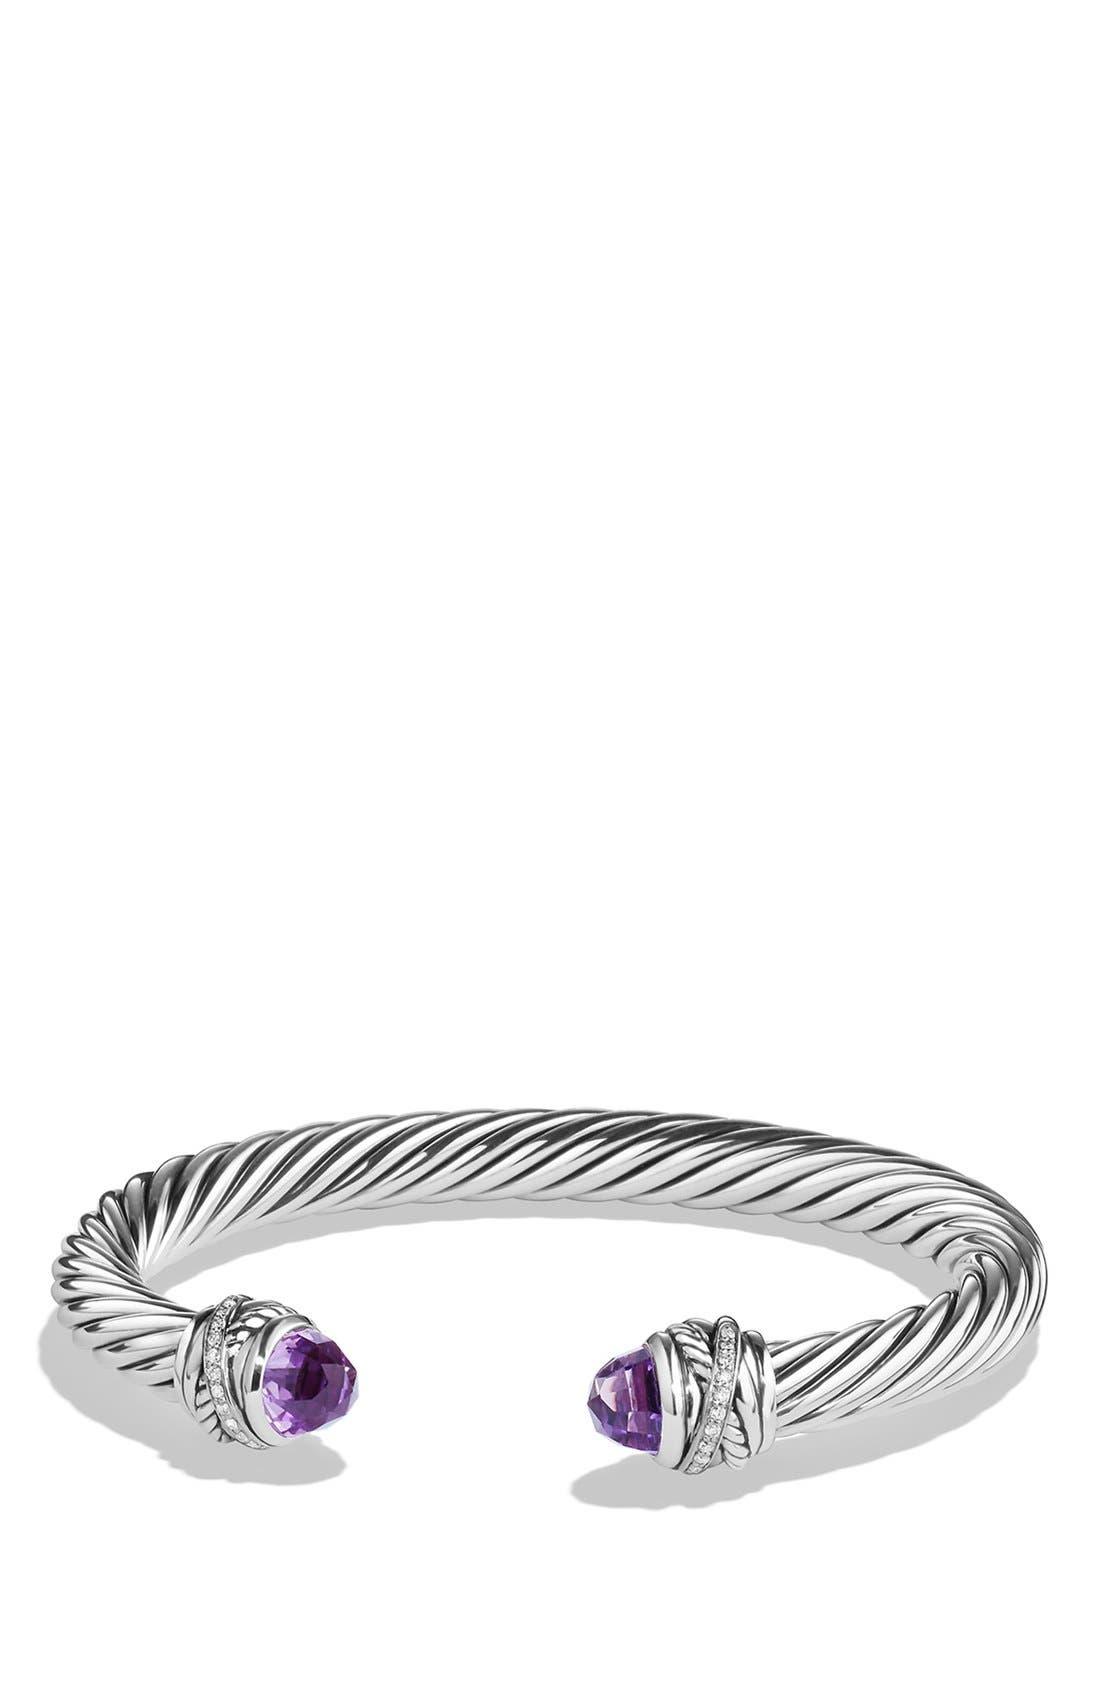 David Yurman 'Crossover' Bracelet with Diamonds